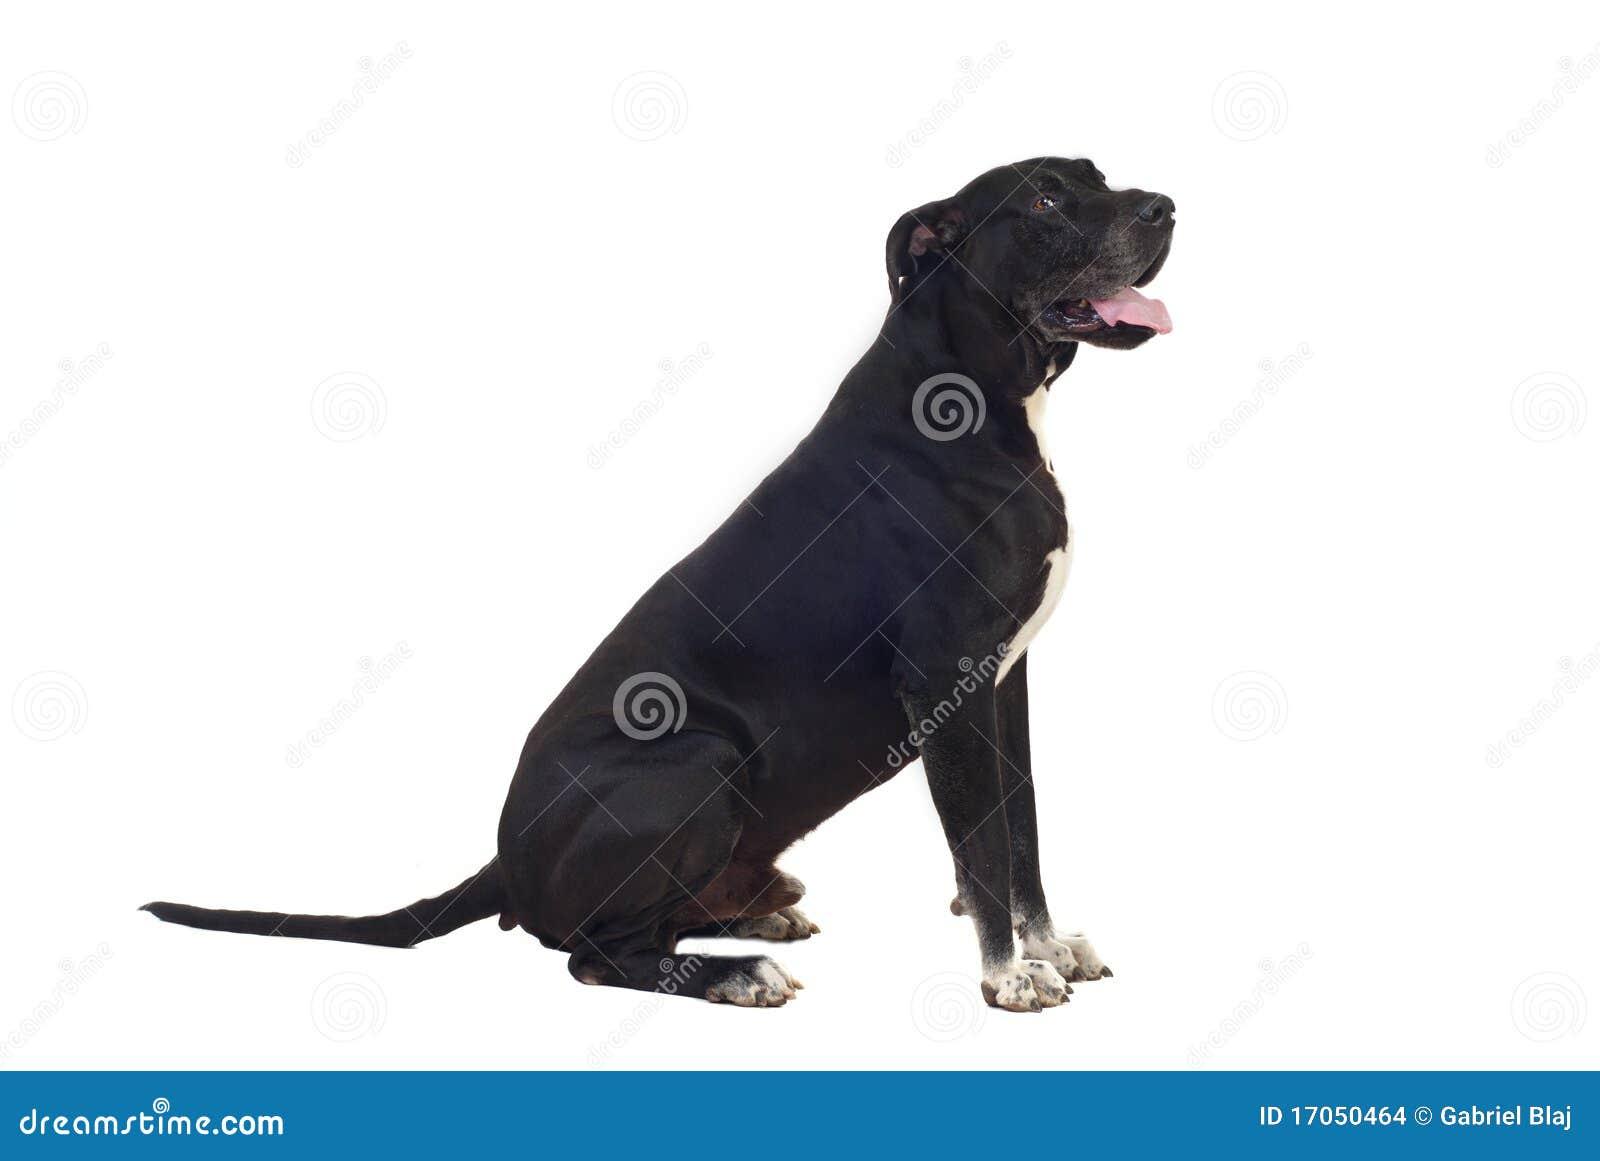 Great Dane Dog Video Download